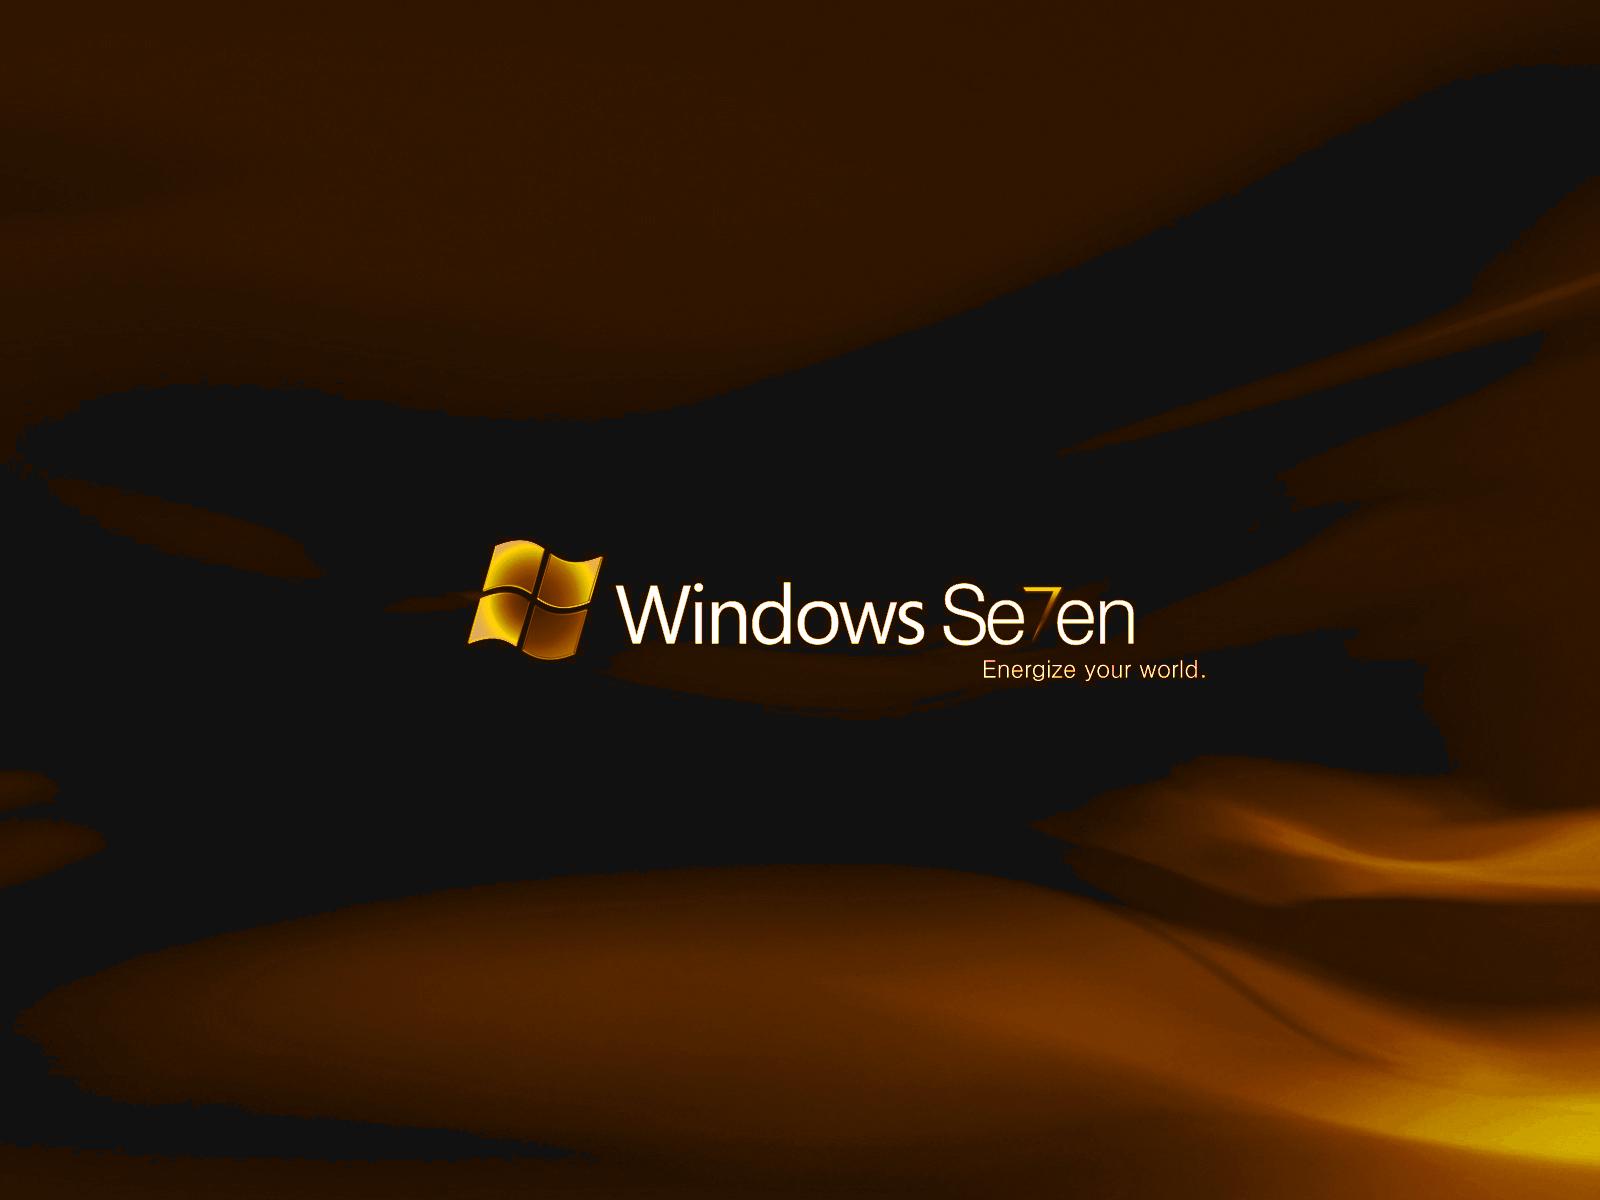 Wallpaper PC » Windows_7_Wallpaper_2_by_The_man_who_writes